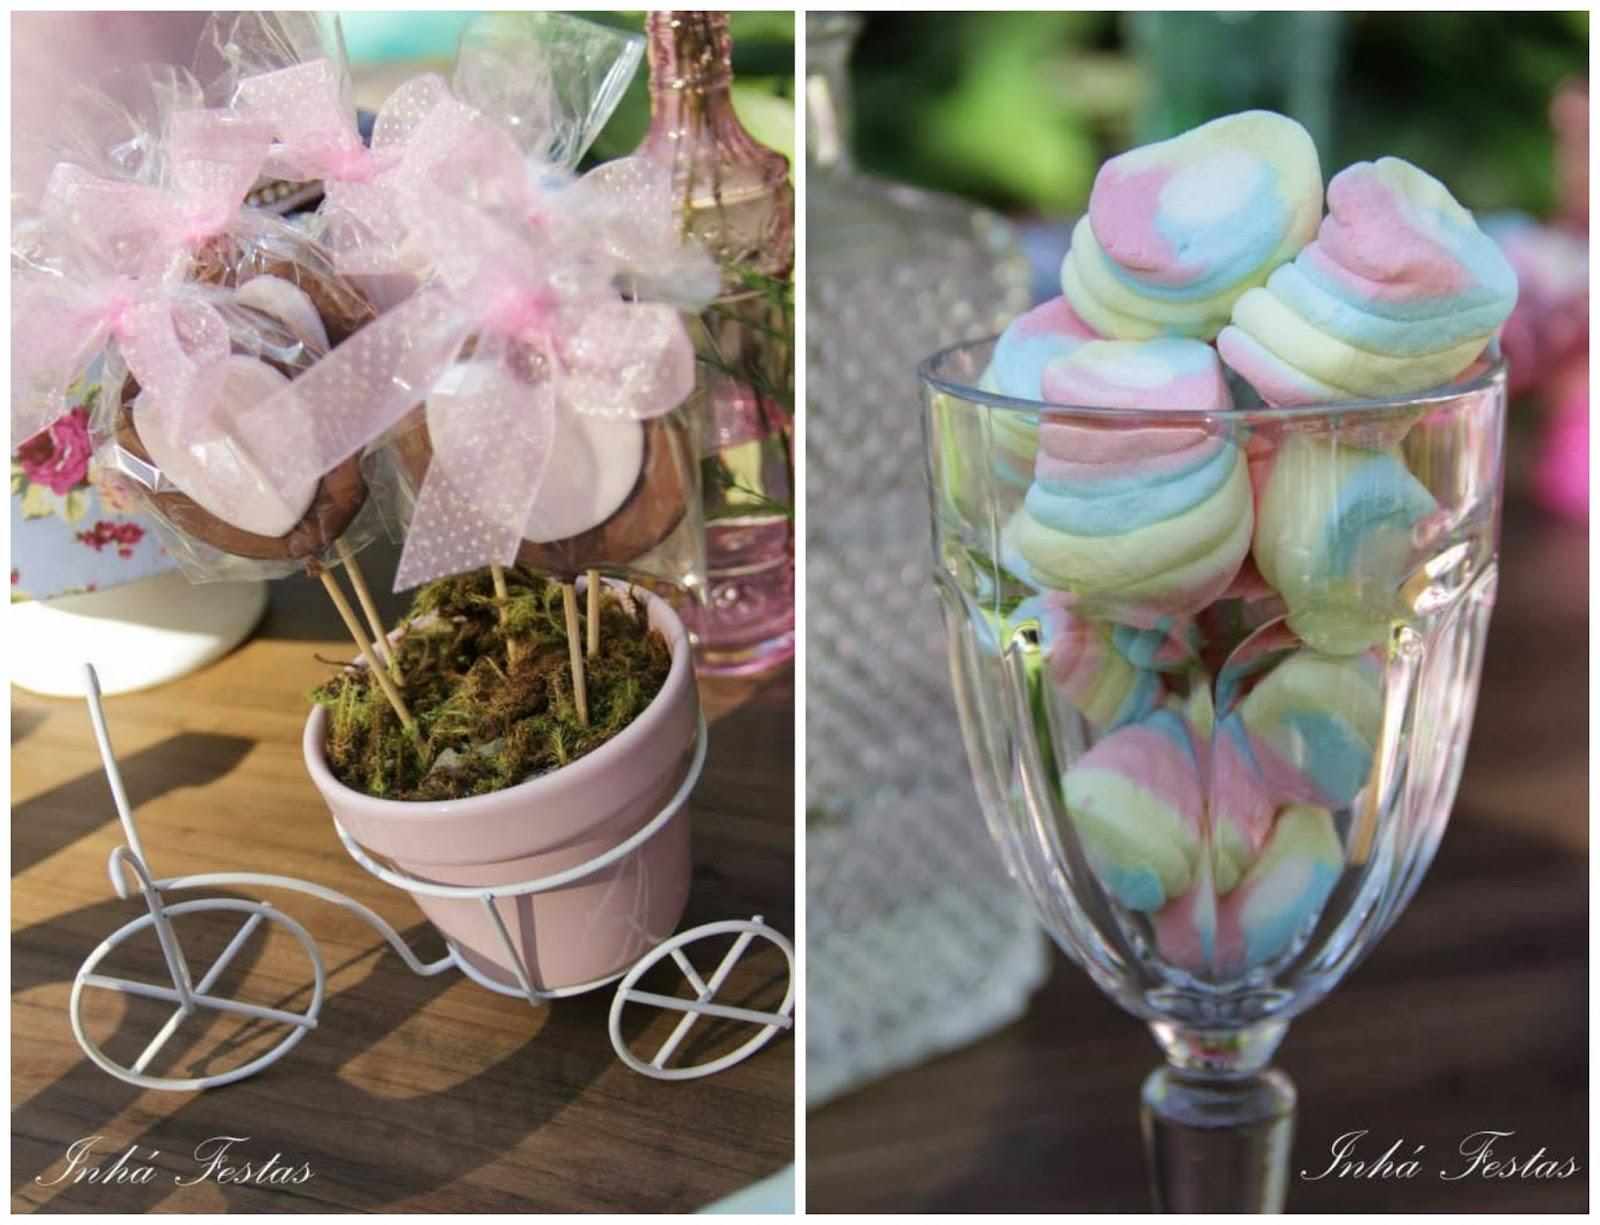 festa-decoracao-romantica-mesa-bolo-guloseimas-1